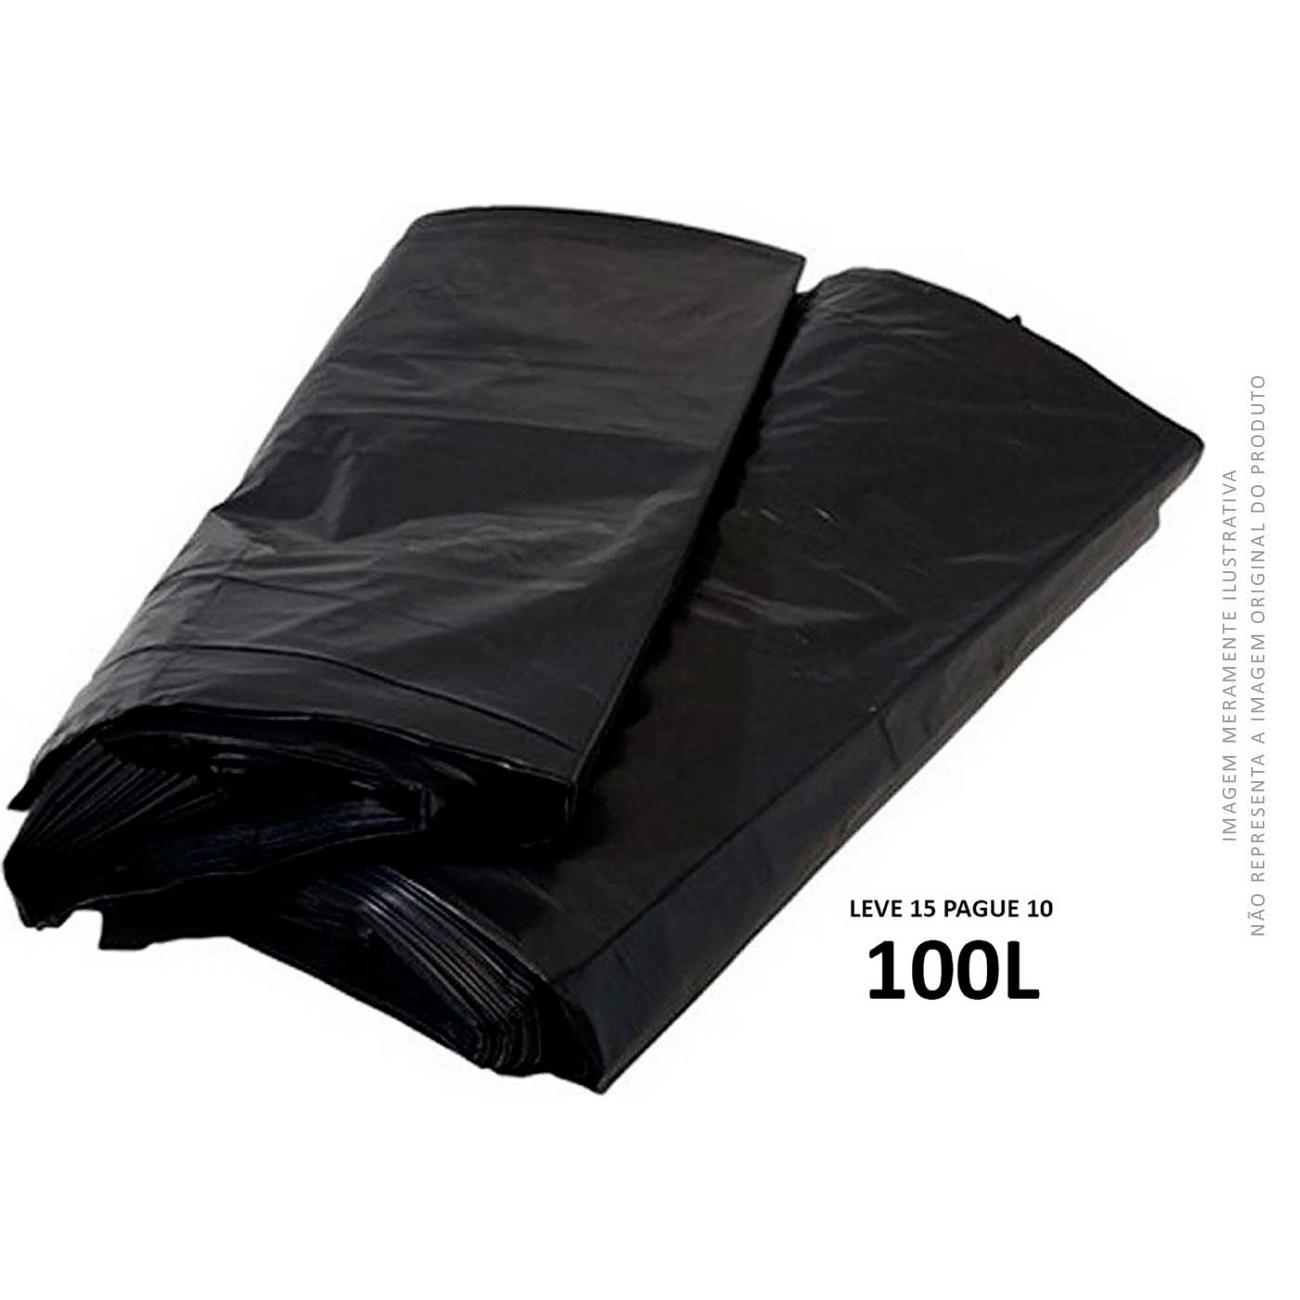 Saco De Lixo Preto MuLlixo 100L | Caixa com 15 unidades